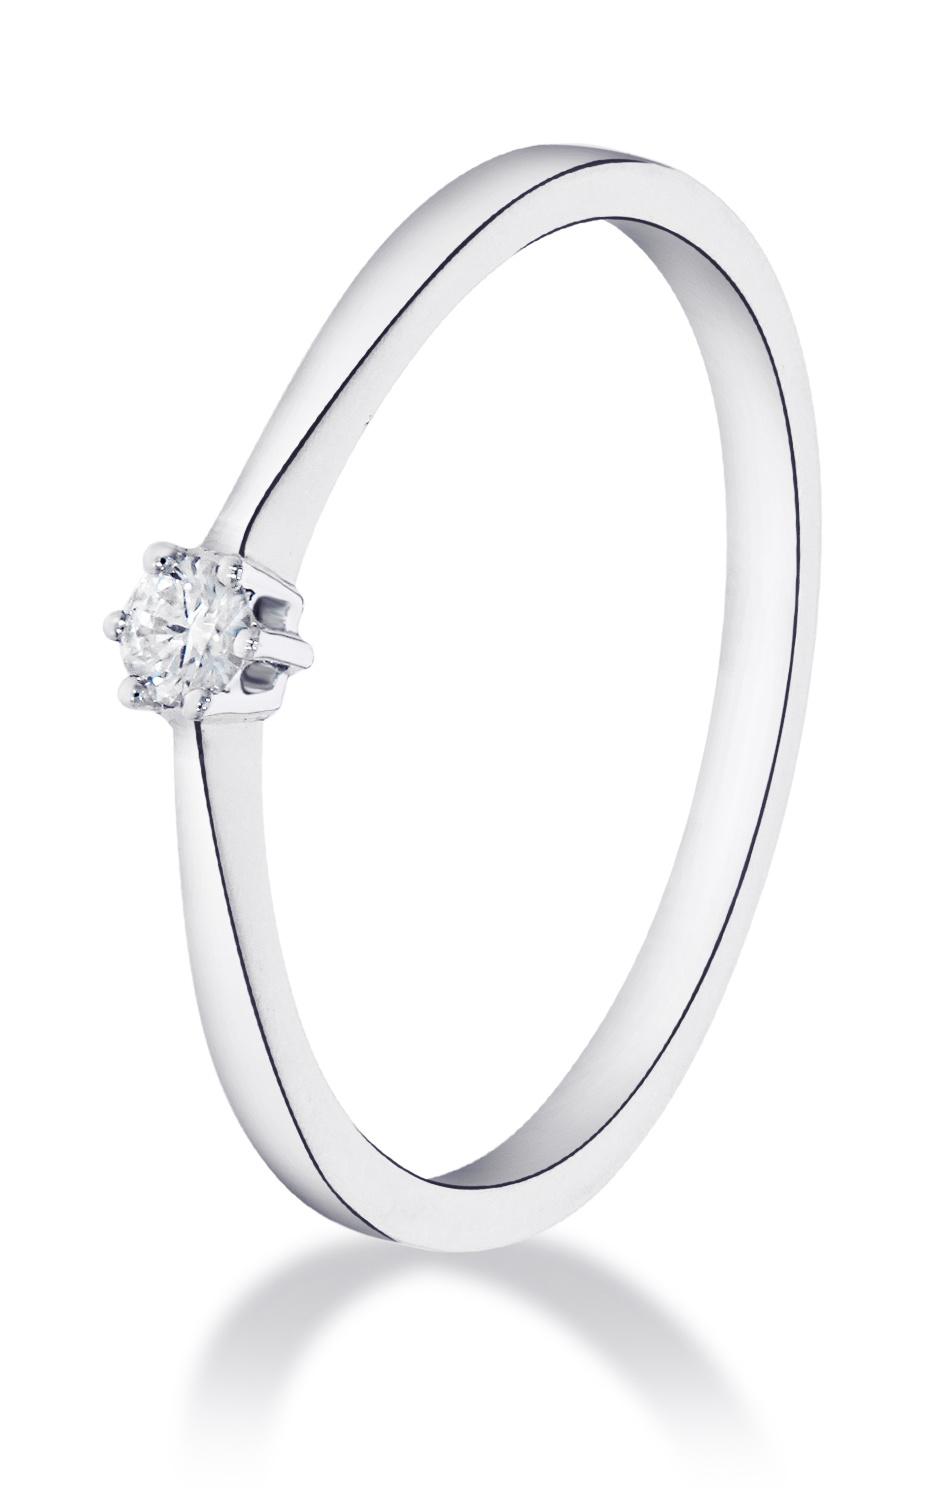 14 karaat witgouden ring met diamant 0.03 crt. - Solitair - Witgoud-1